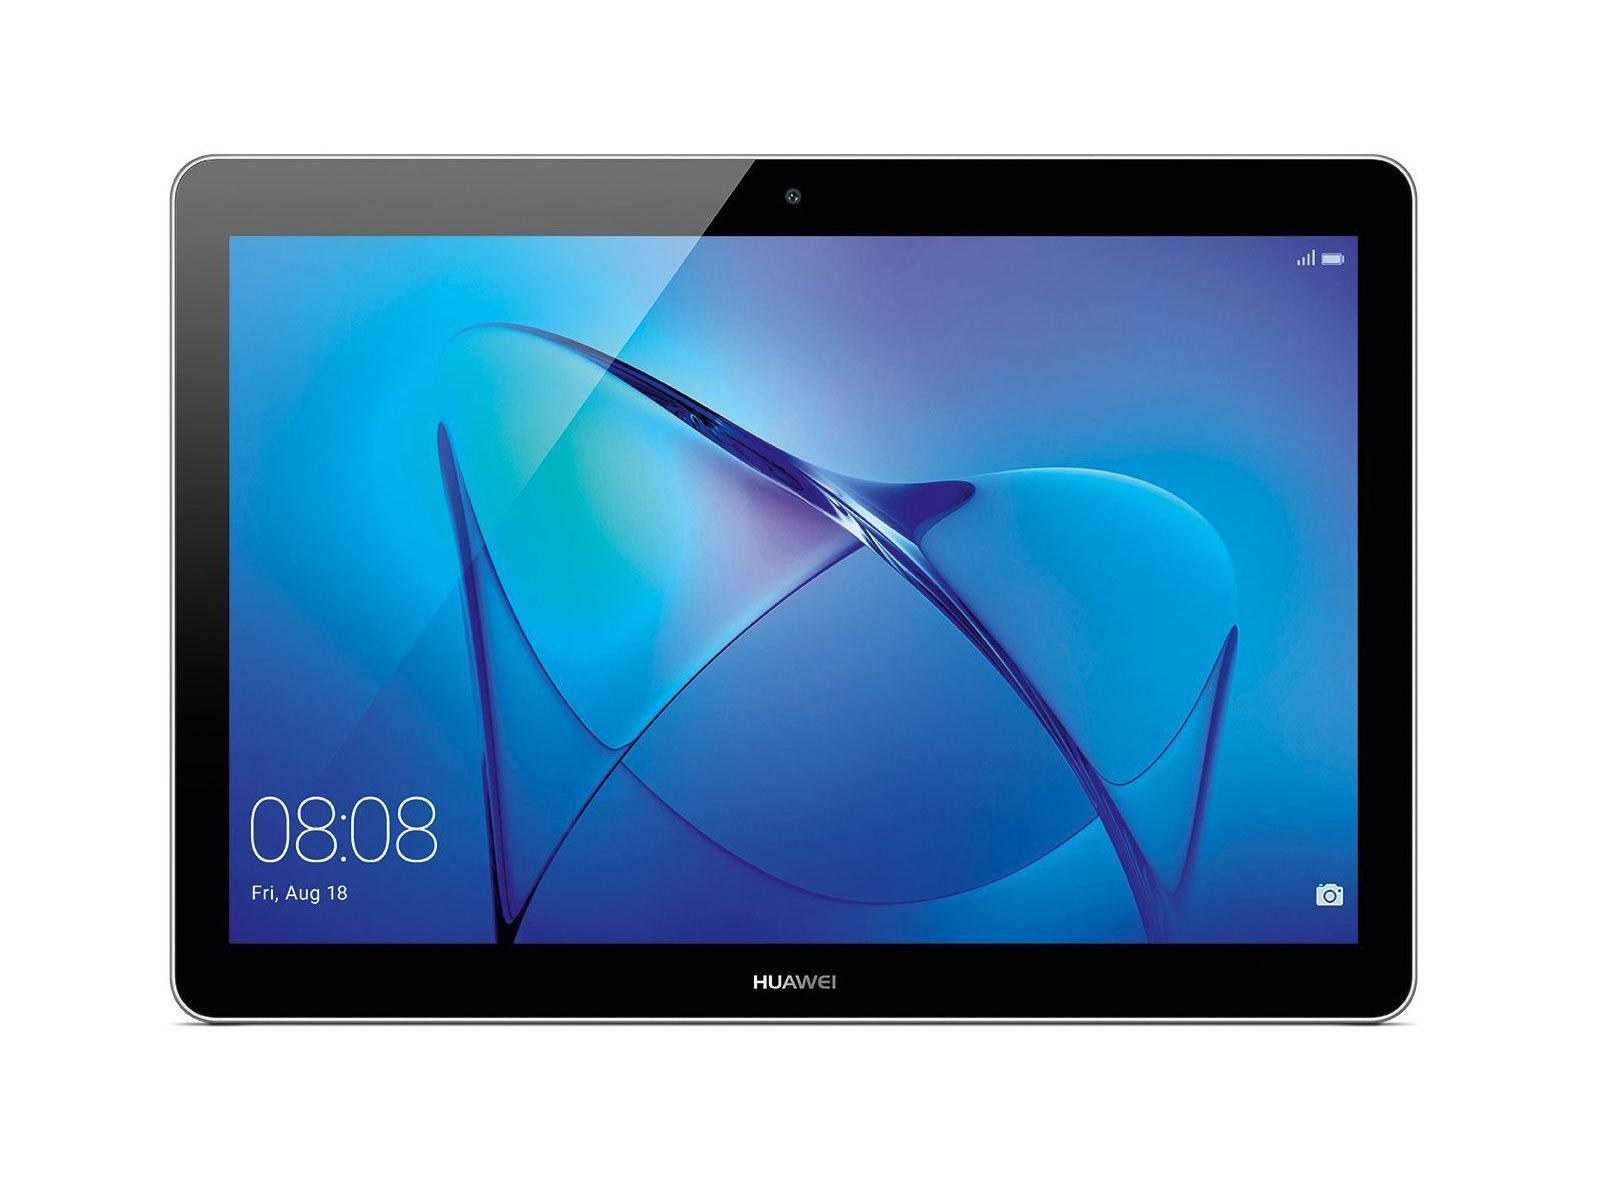 Tablette MediaPad T3 10 16 Go Wi-Fi Huawei Gris sidéral